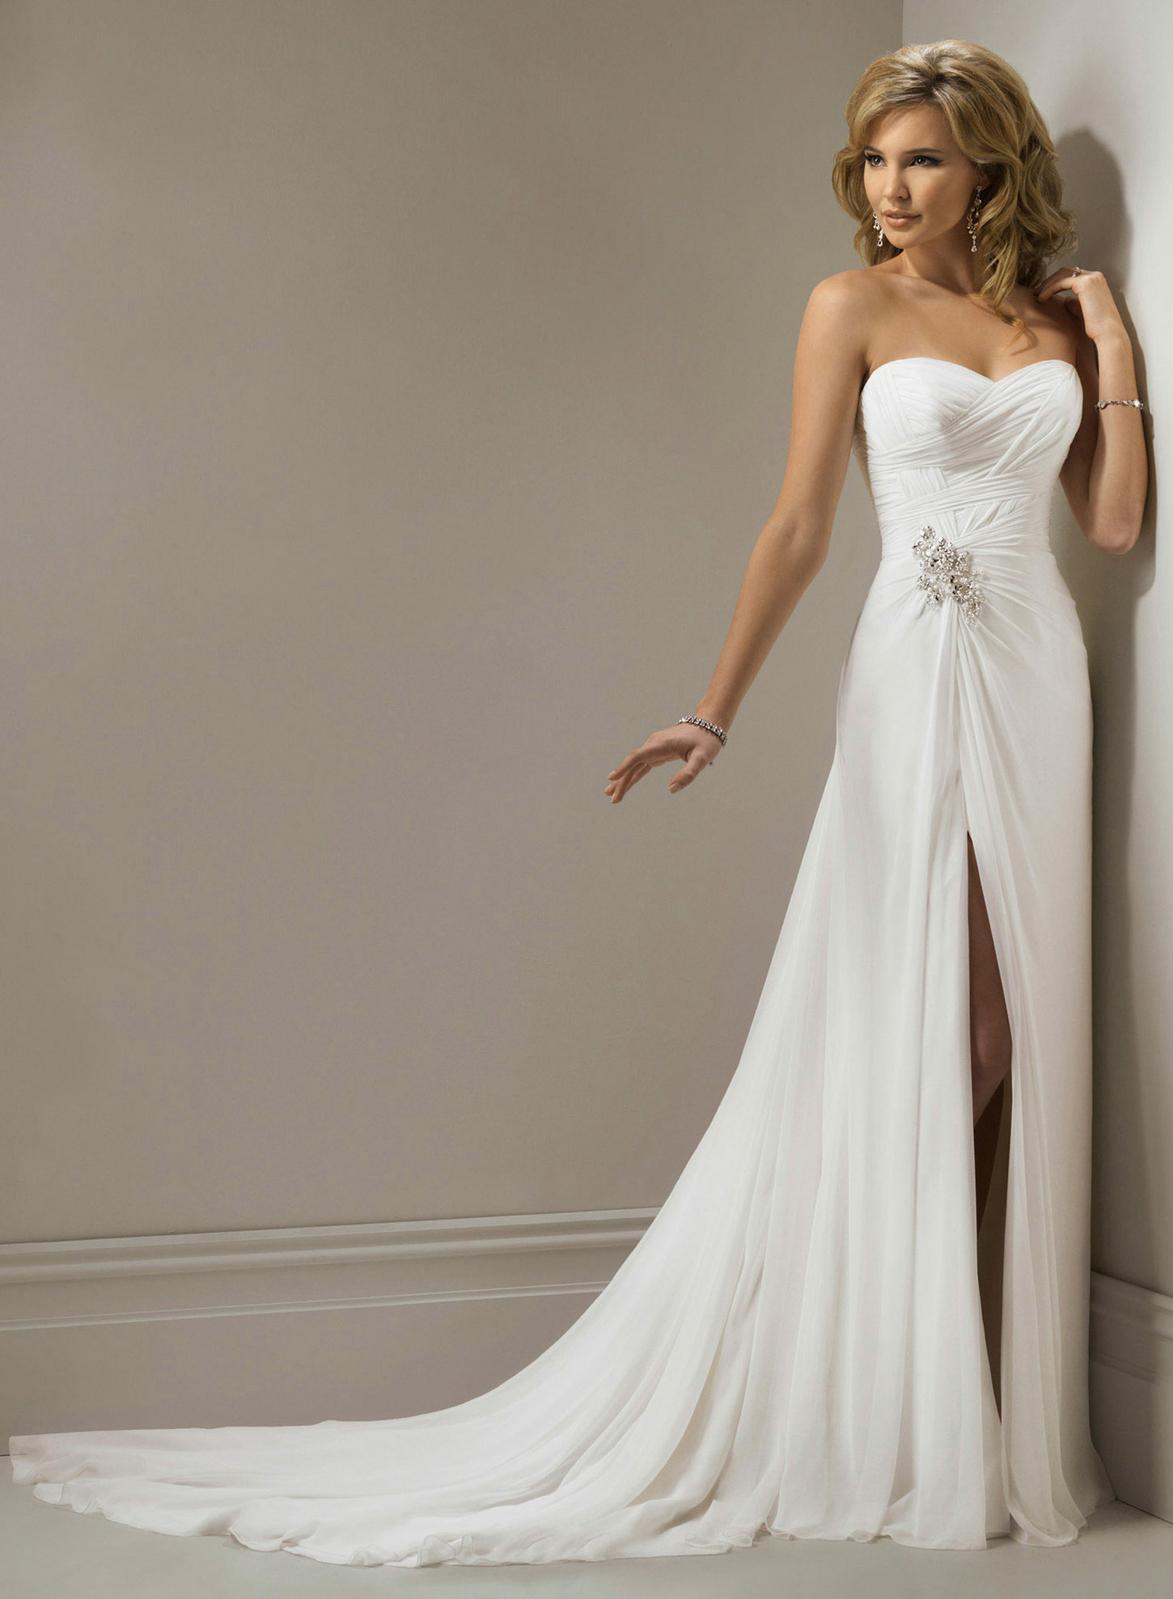 Ak aty na svadbu na pl i svatebn aty for Online wedding dresses for sale